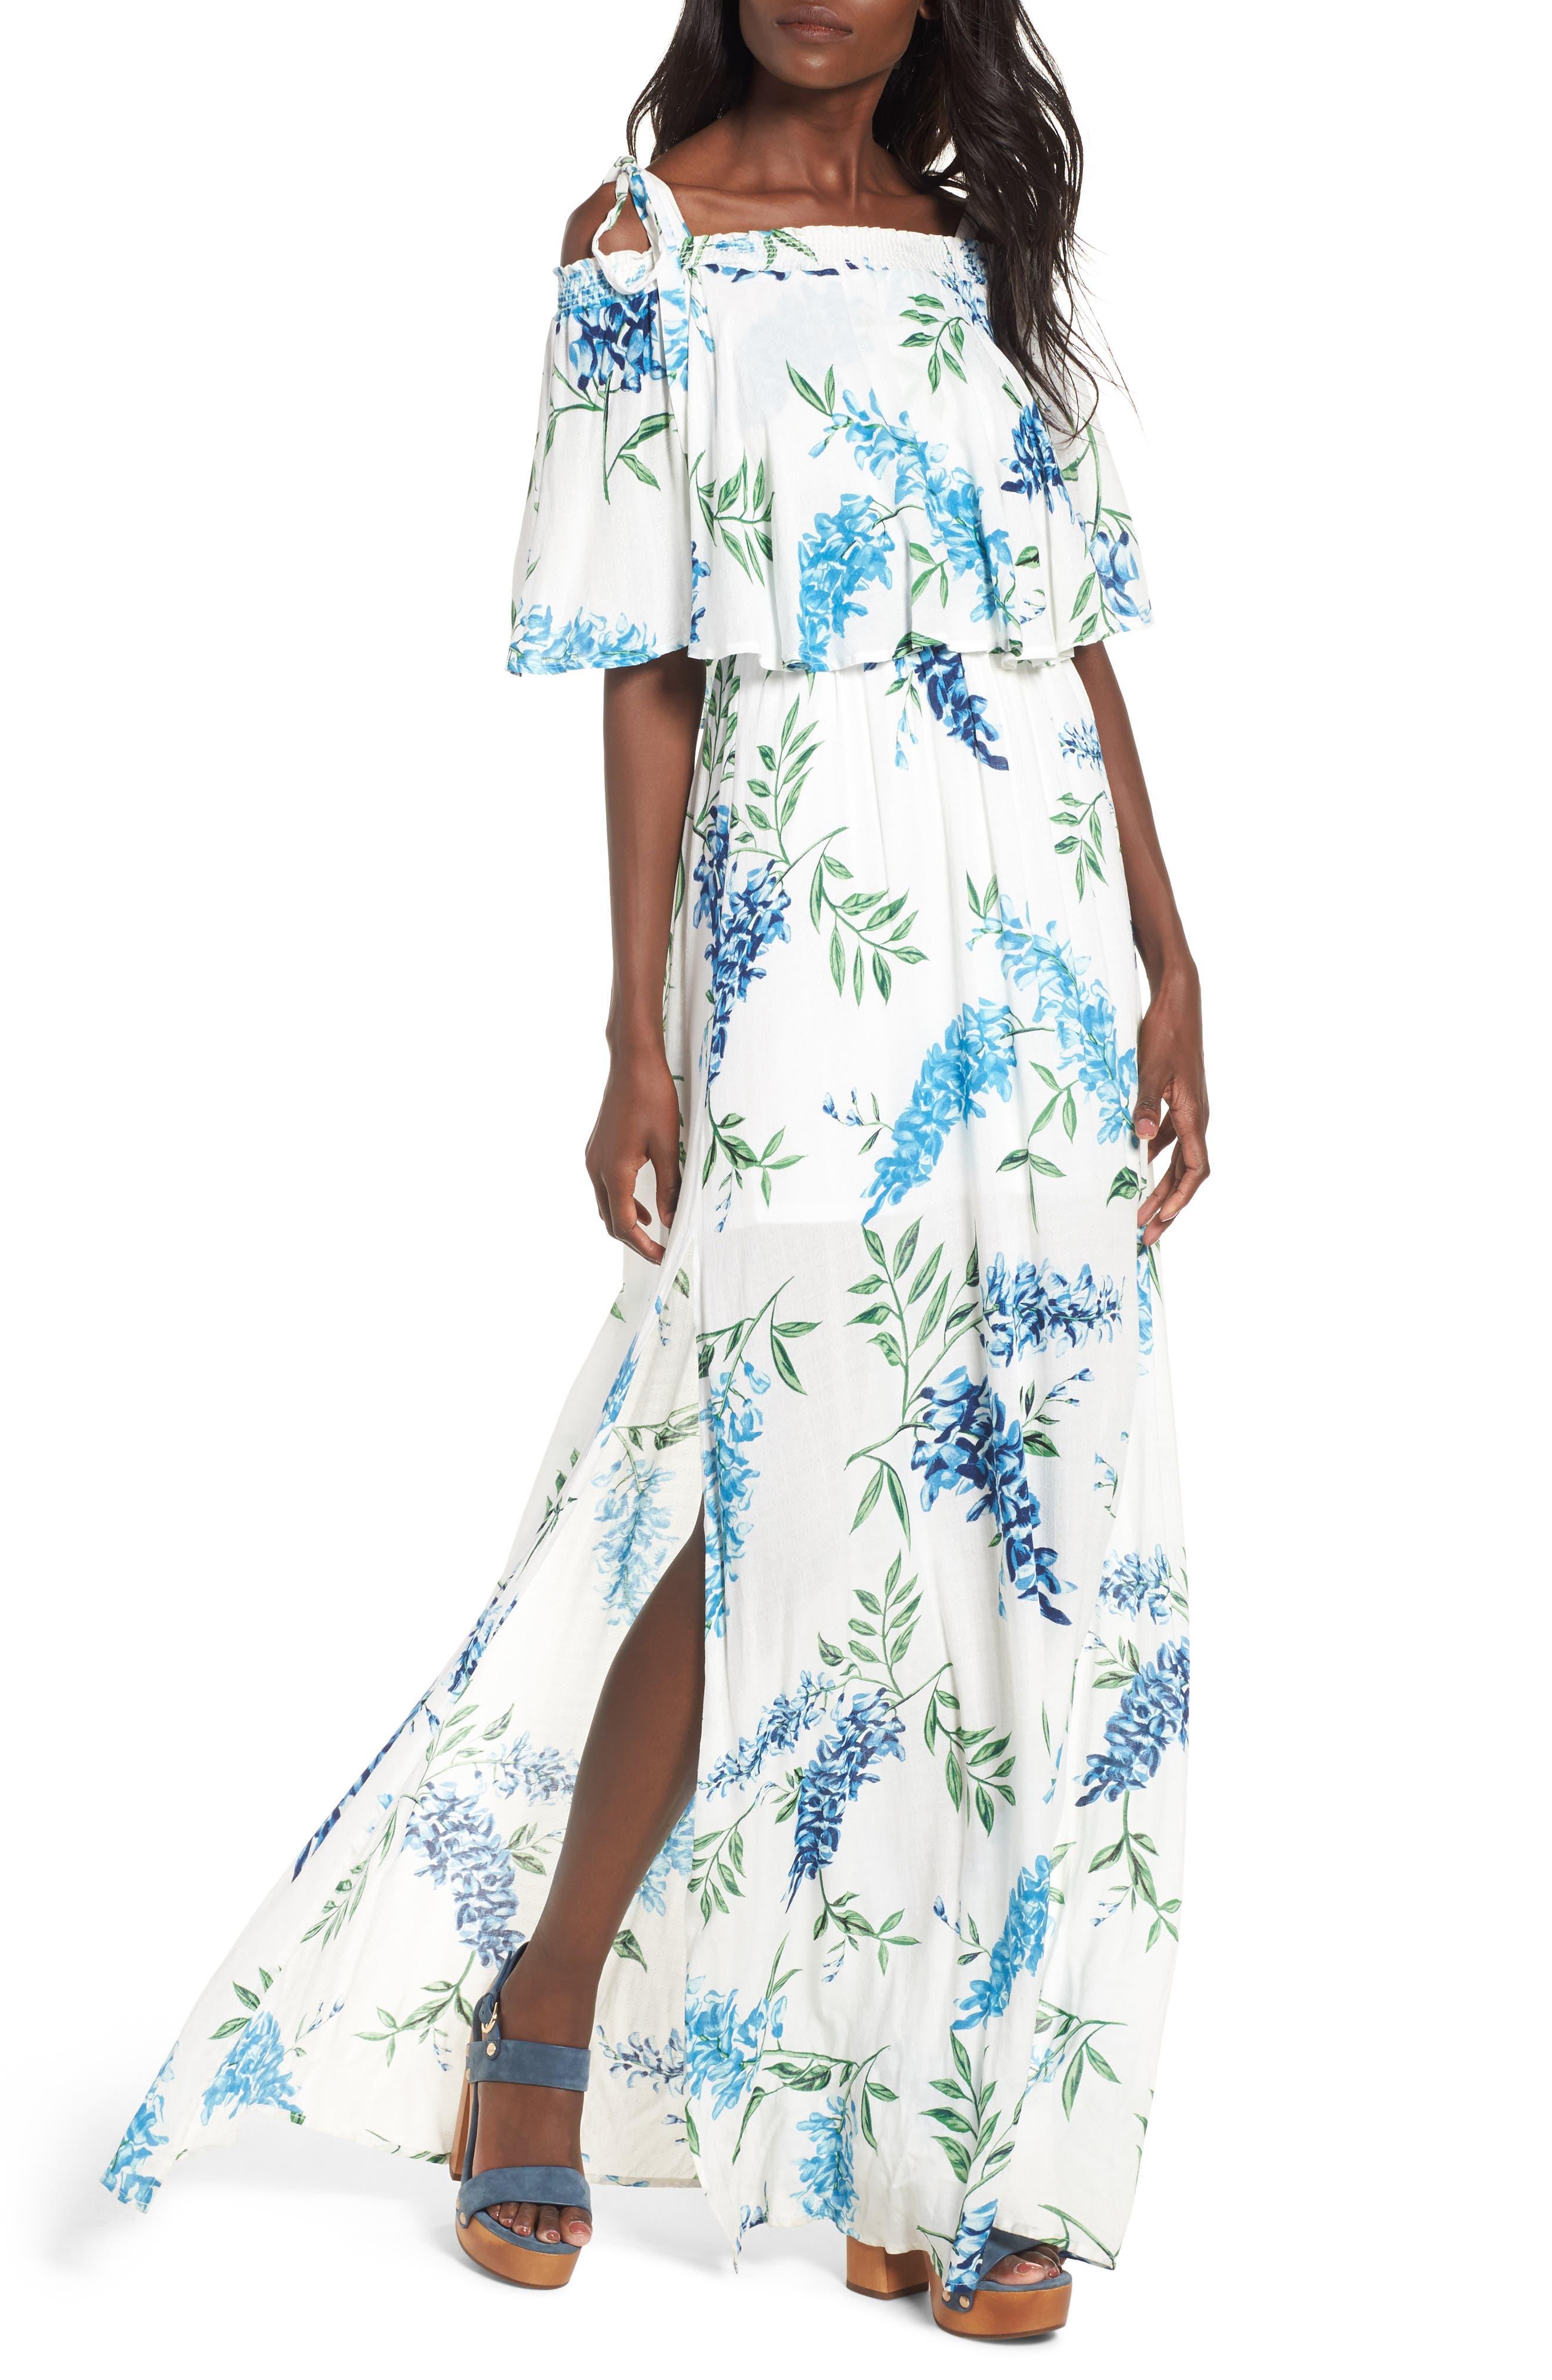 Main Image - Show Me Your Mumu Nicola Ruffle Maxi Dress